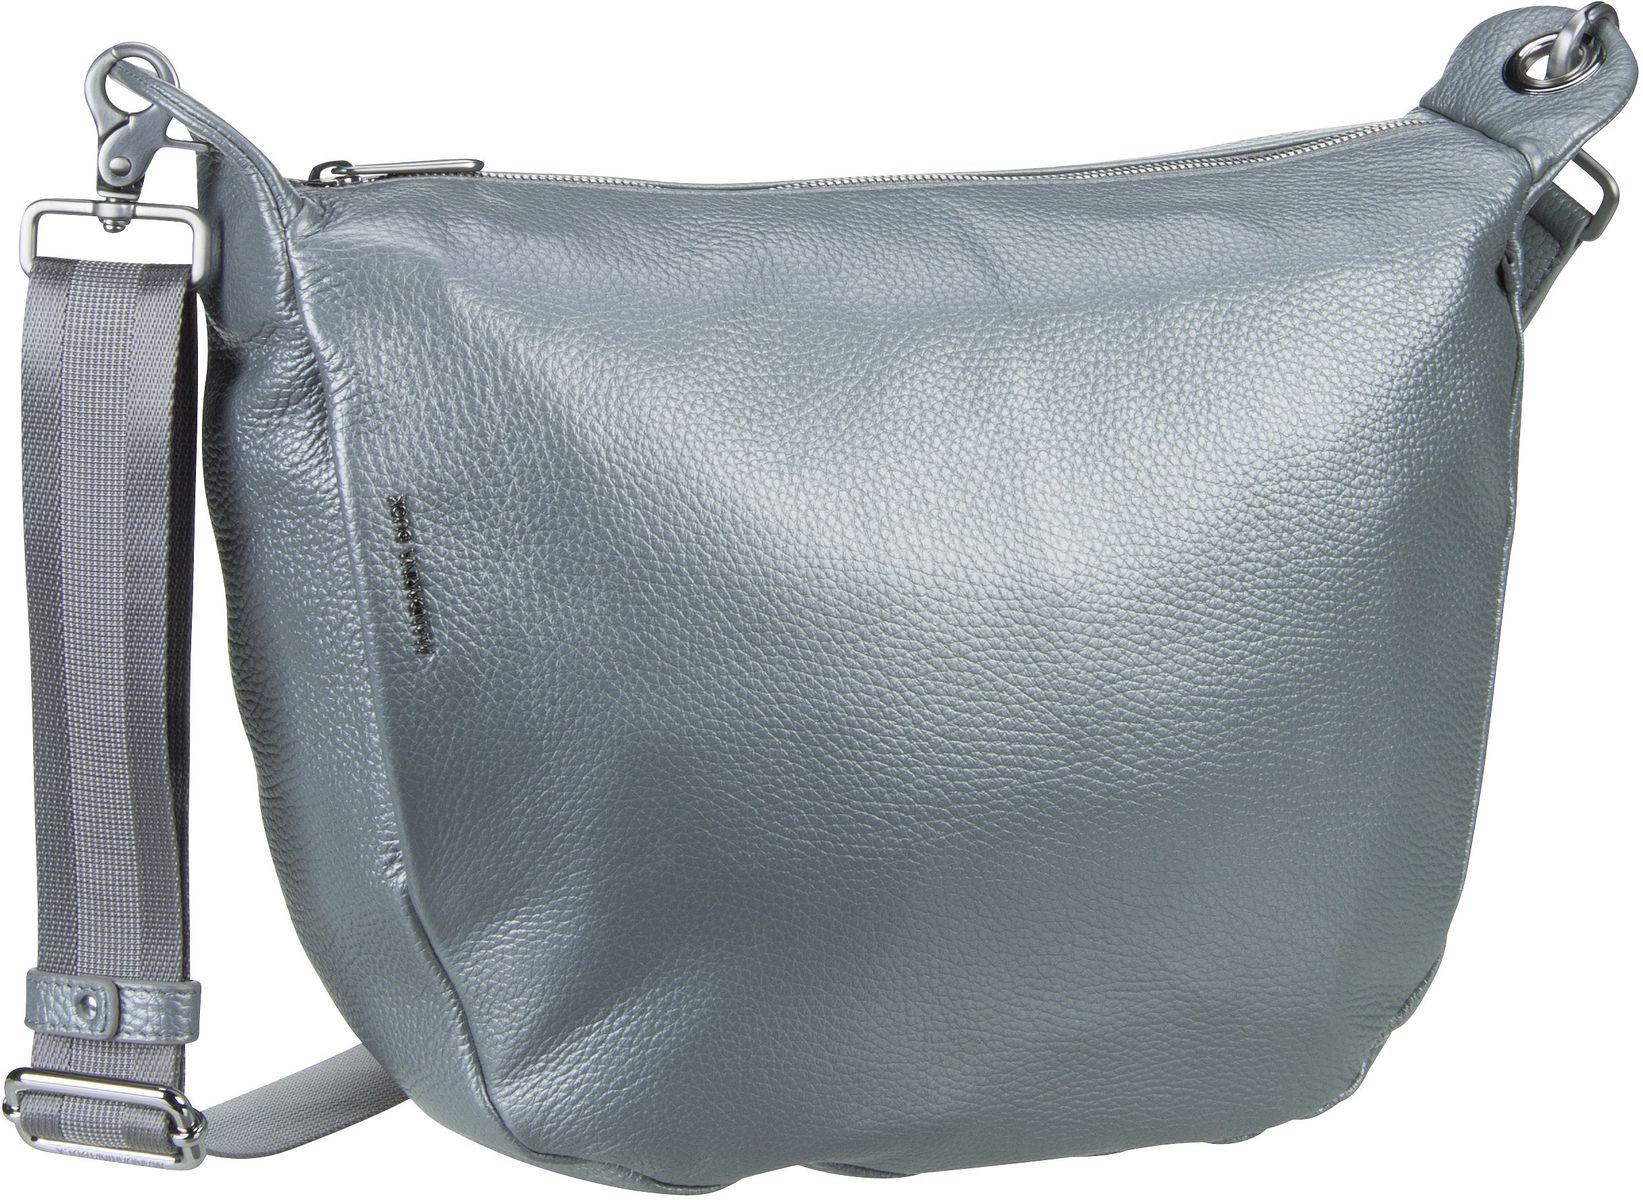 Umhängetasche Mellow Leather Lux Crossover ZLT59 Silver